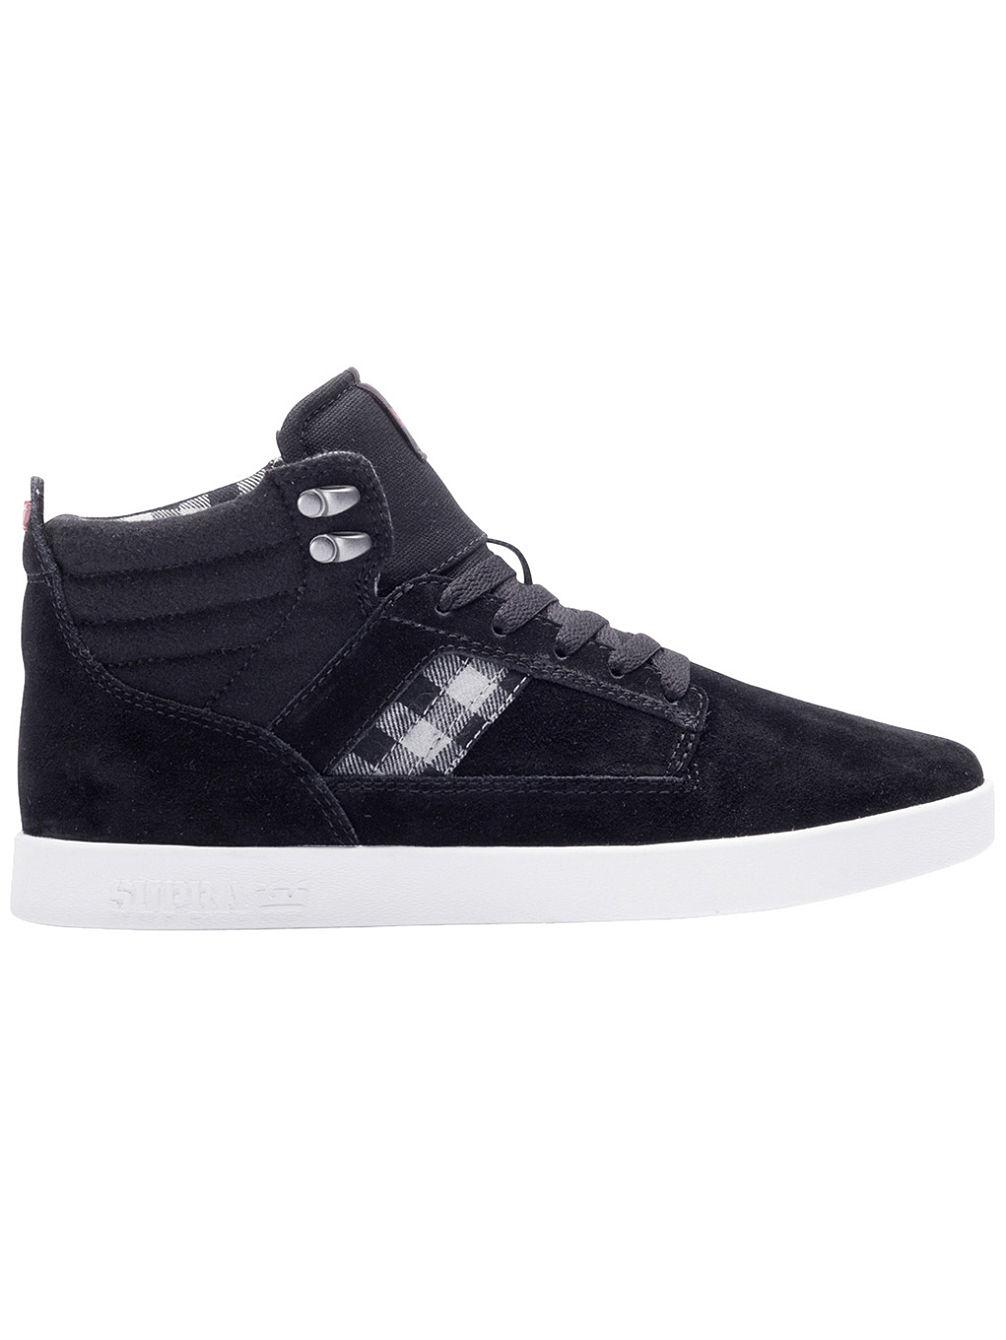 bandit-sneakers